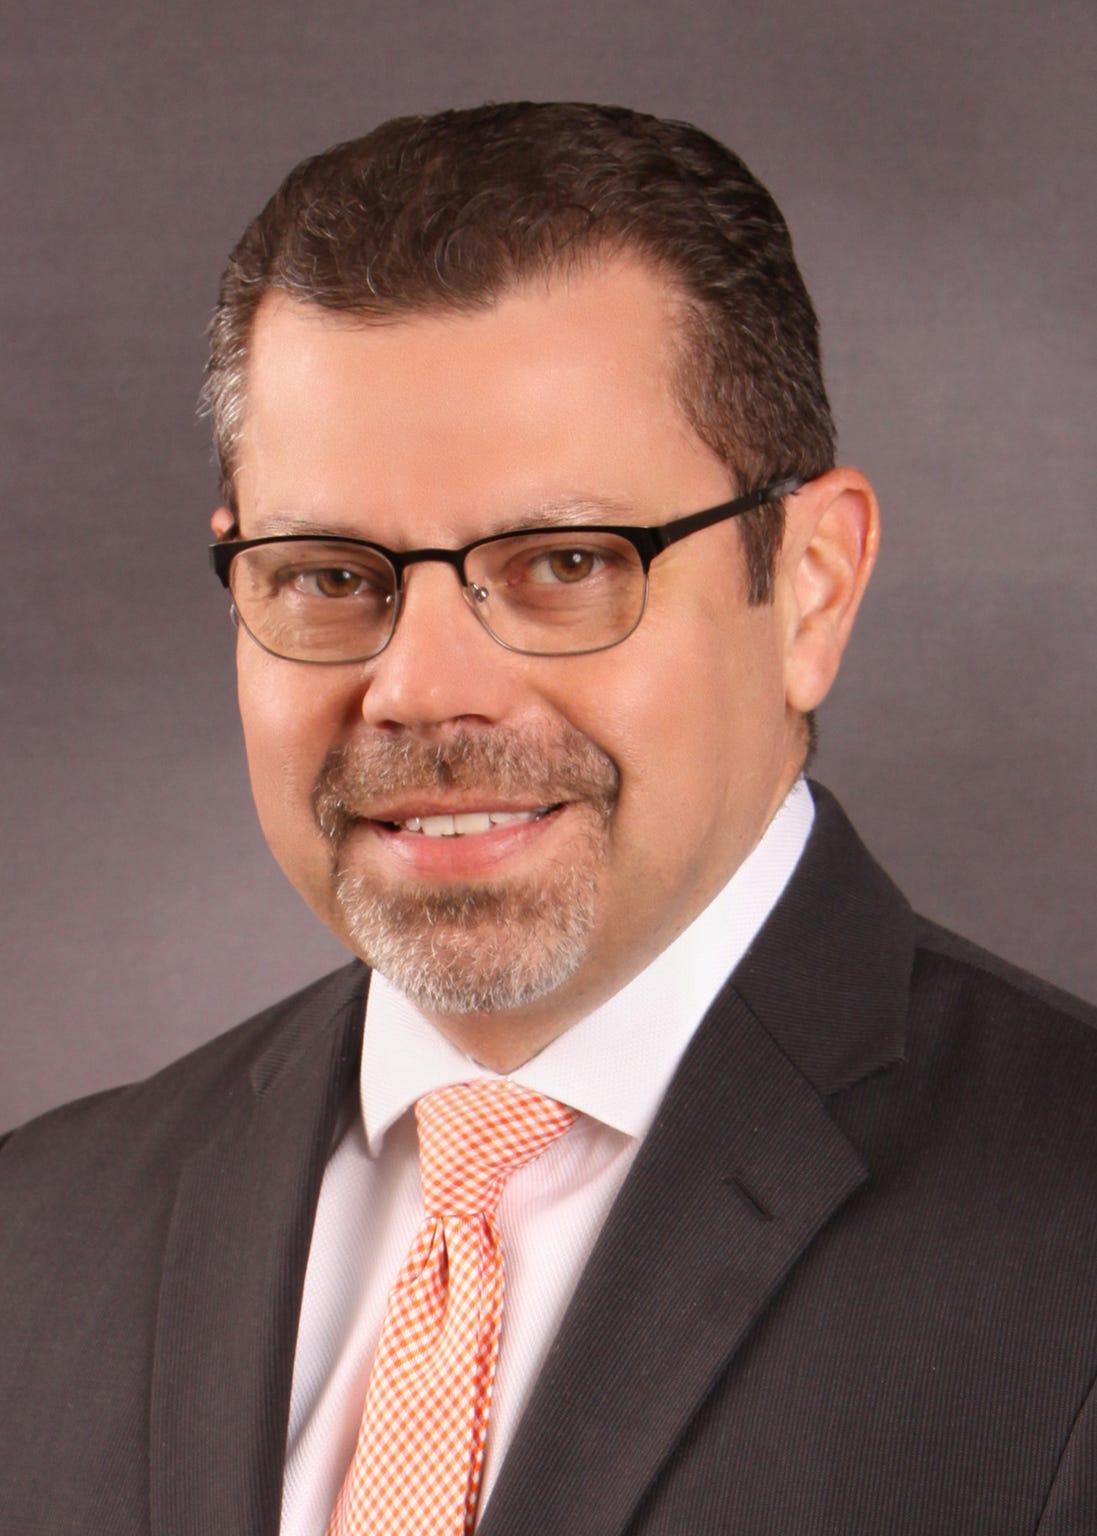 Corpus Christi City Council District 3 candidate Roland Barrera